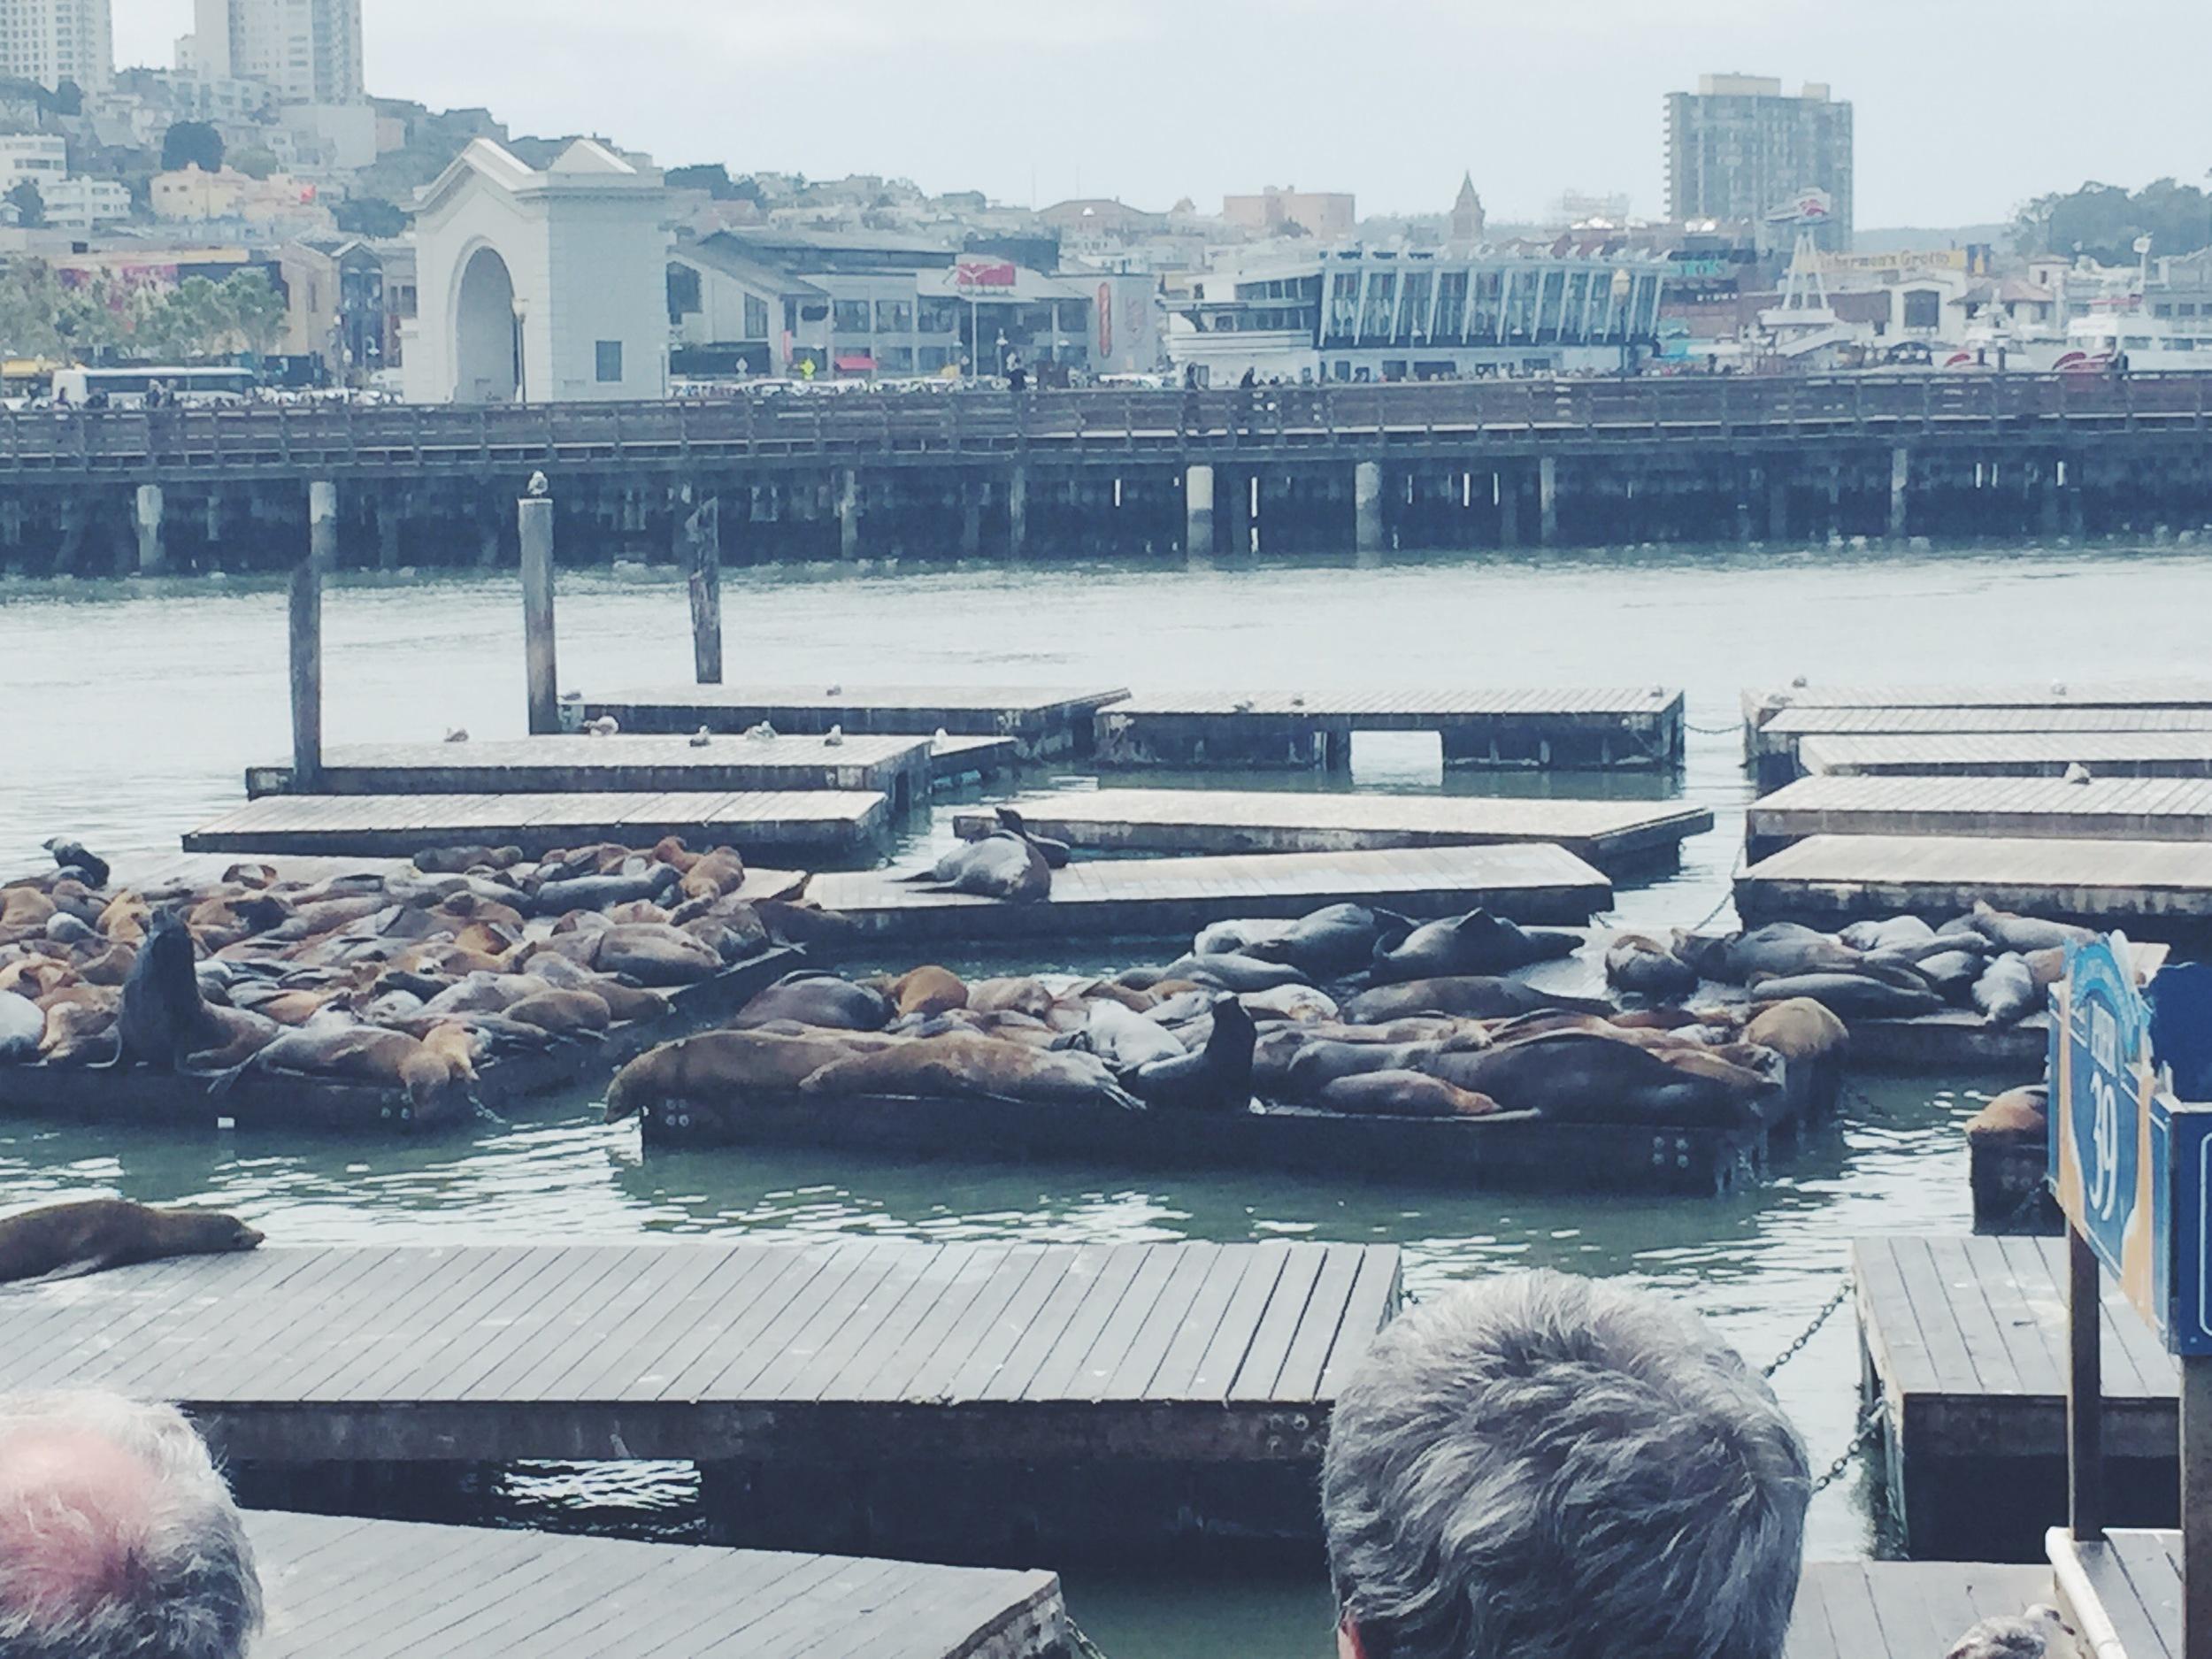 Pier 39 - Sea Lions on Docks